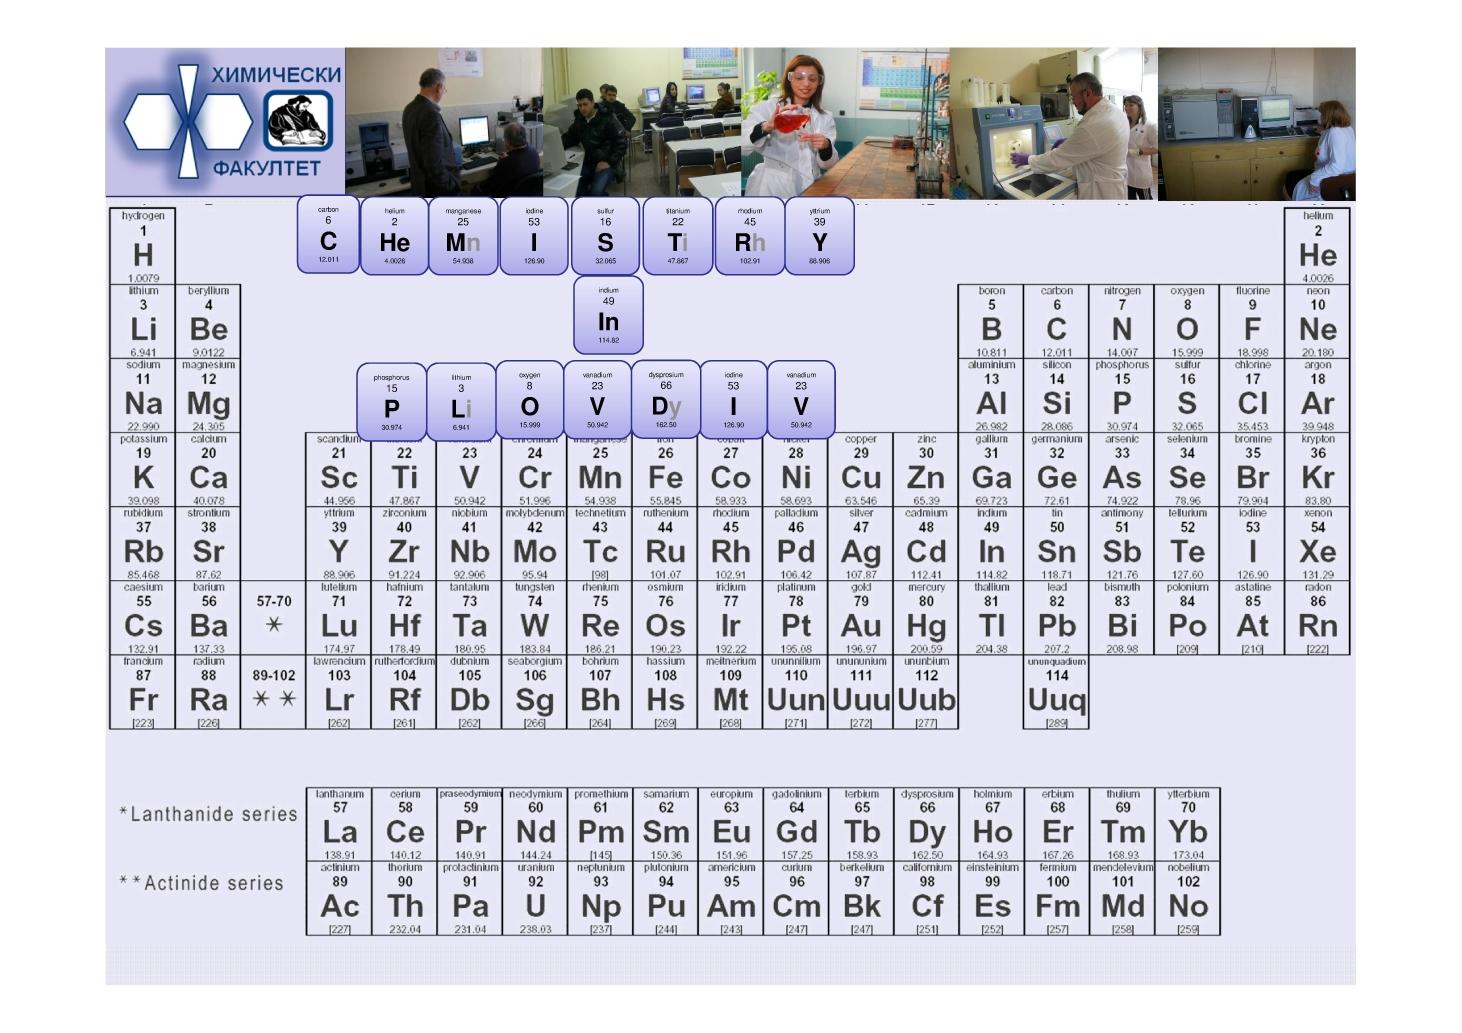 Chemisry_in_Plovdiv